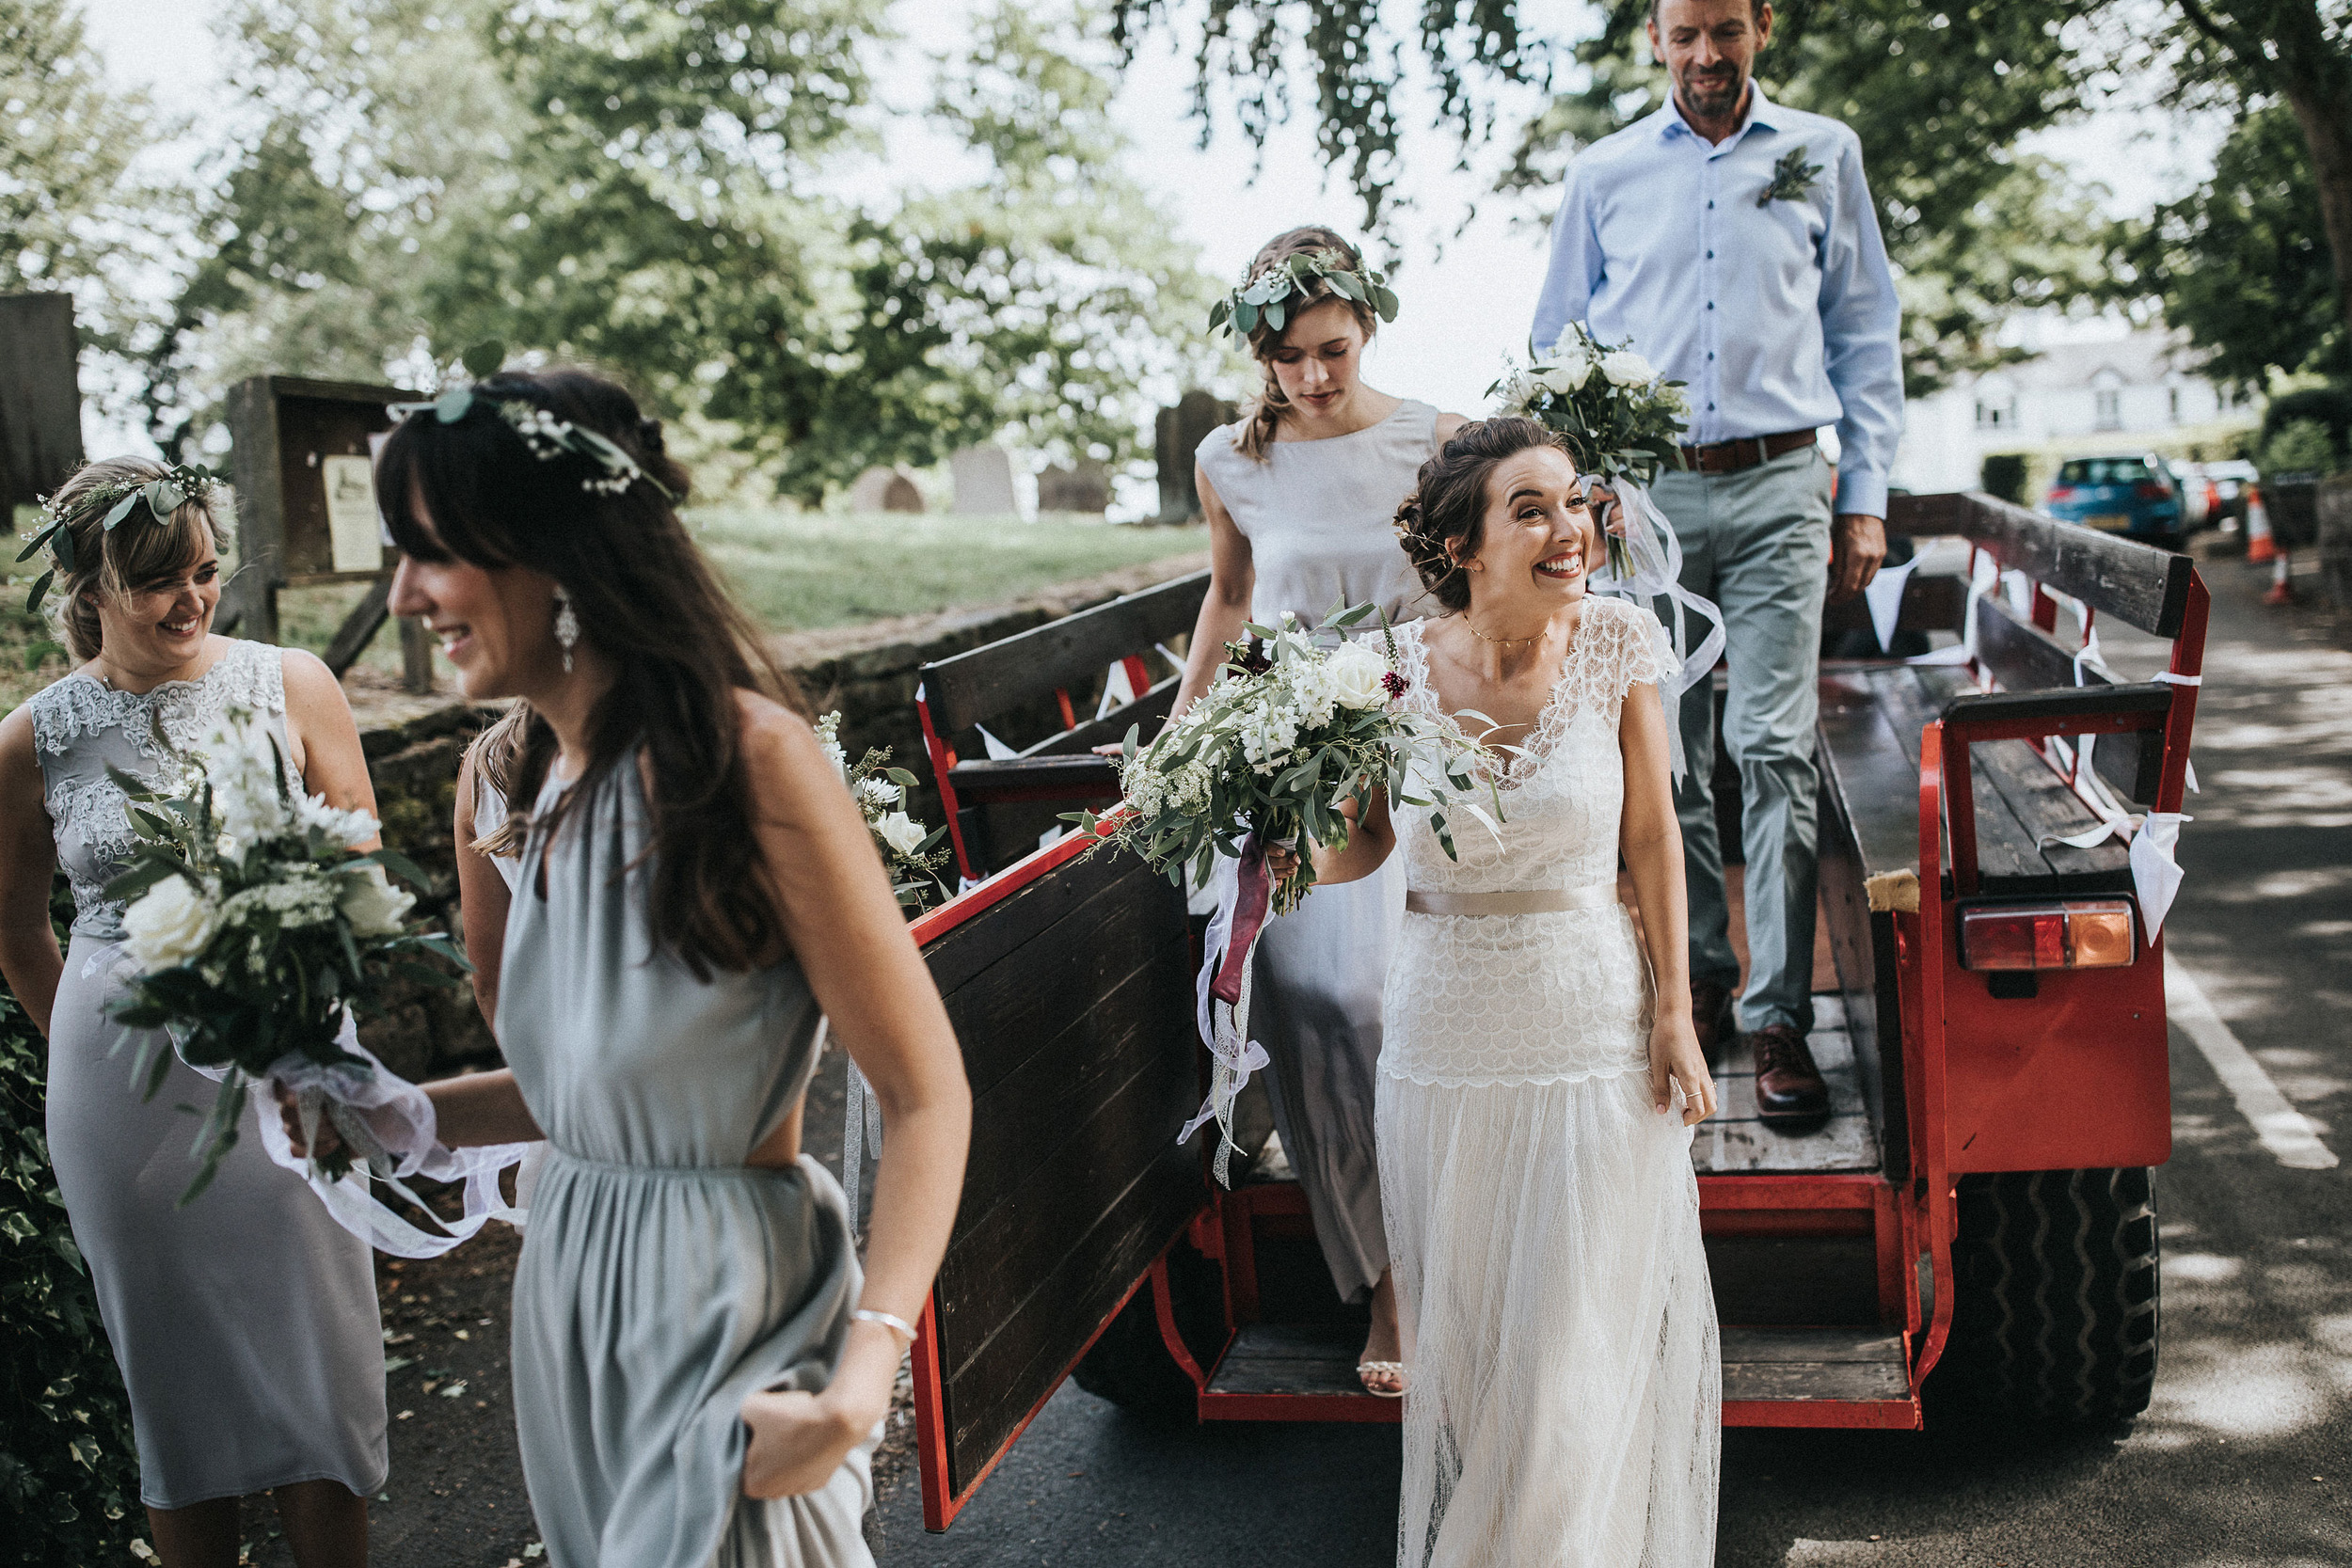 Martha-Laid-Back-Garden-Wedding-Lace-Wedding-Dress-Bohemian-Kate-Beaumont-11.jpg